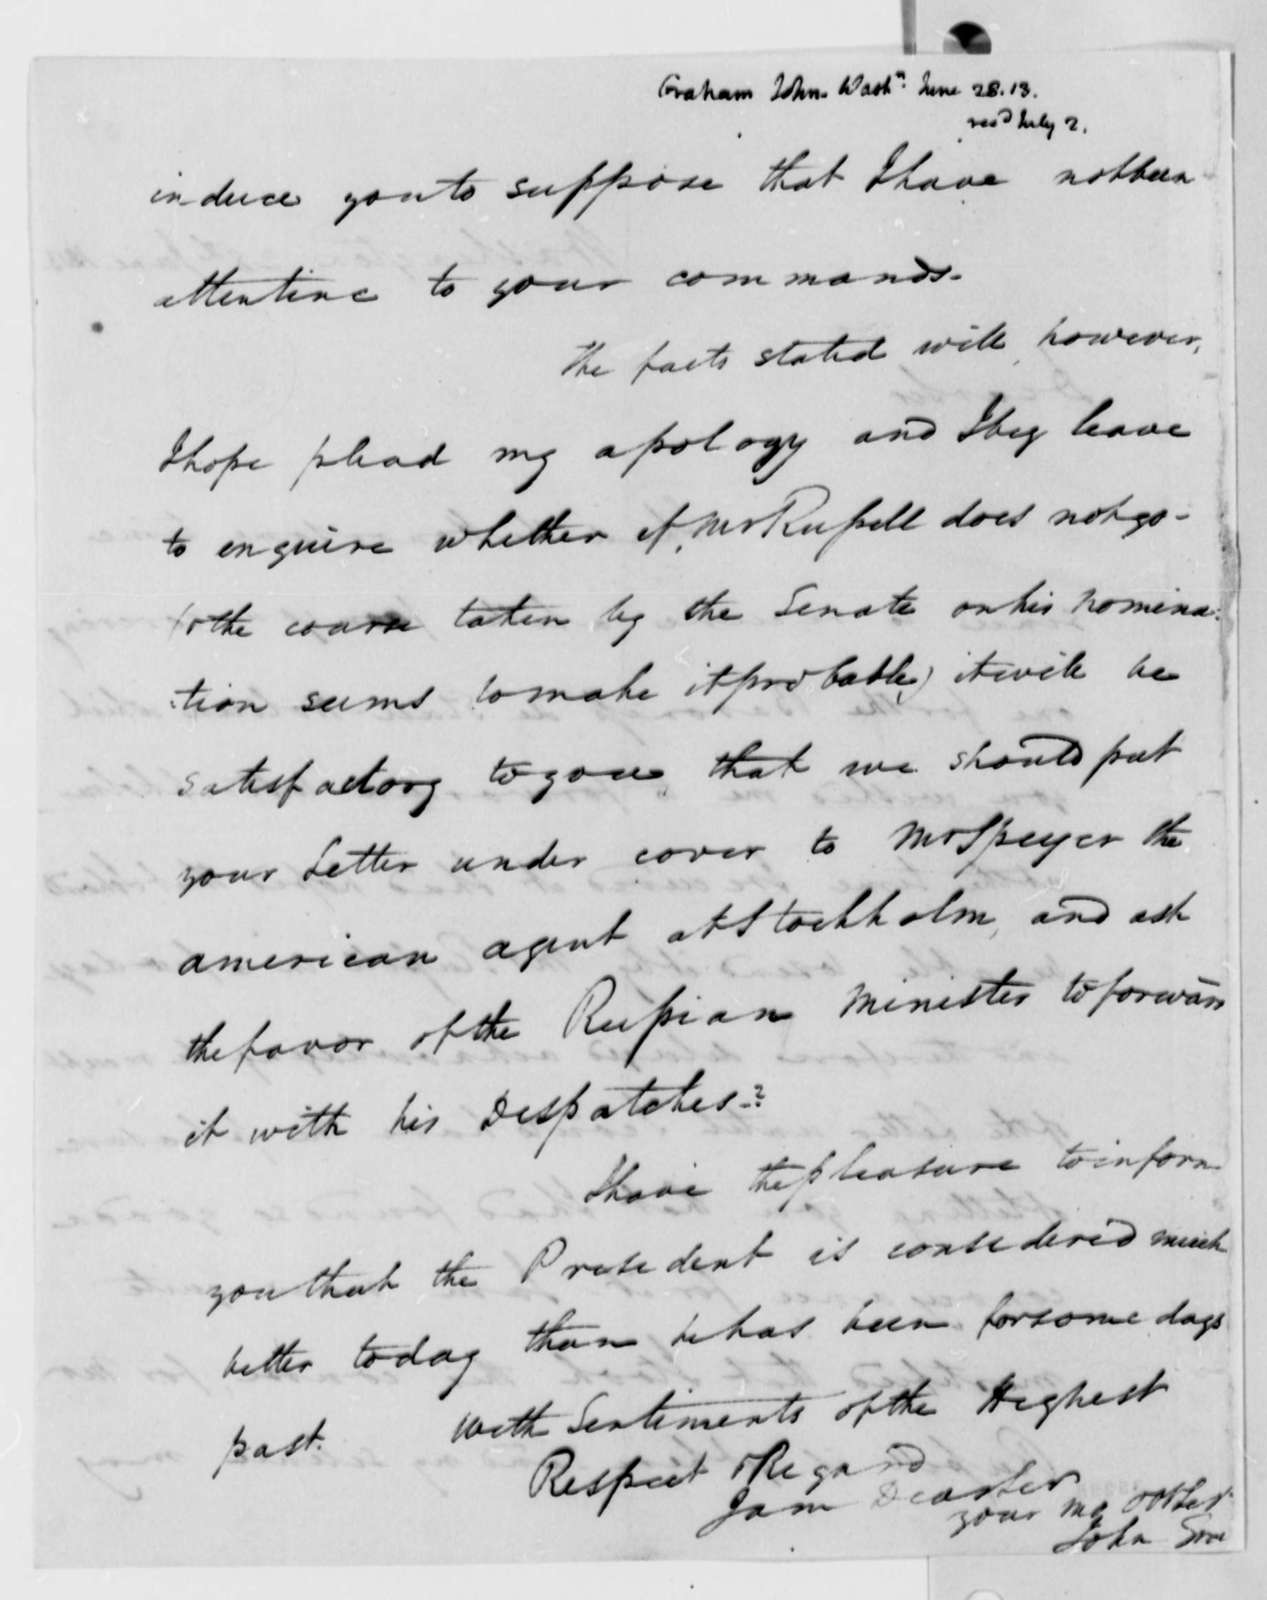 John A. Graham to Thomas Jefferson, June 28, 1813